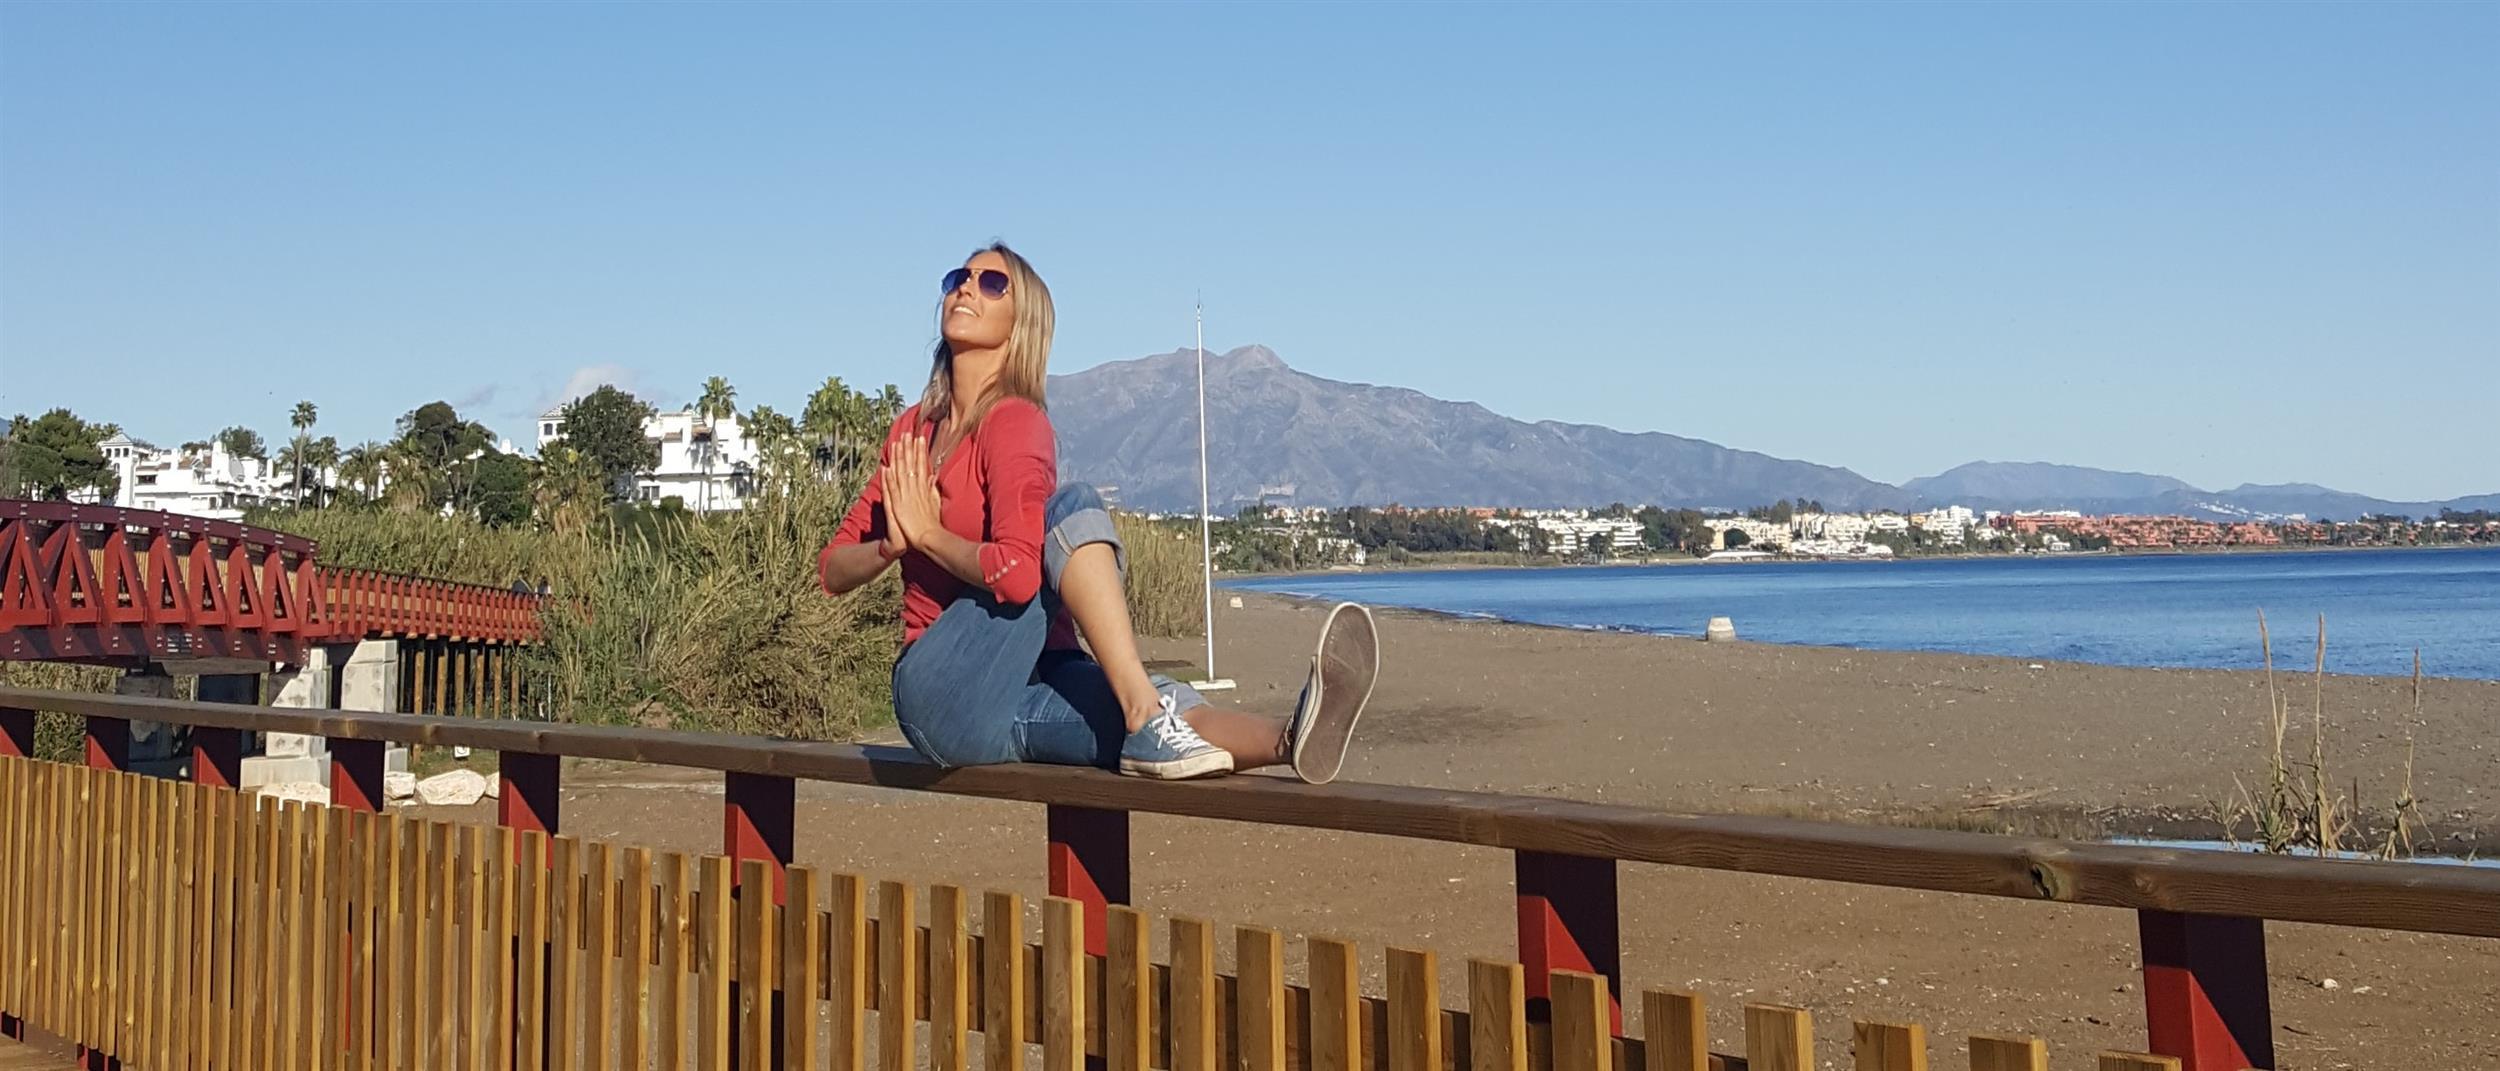 Yoga Photo - twist in front of La Concha Mountain, Marbella, Spain